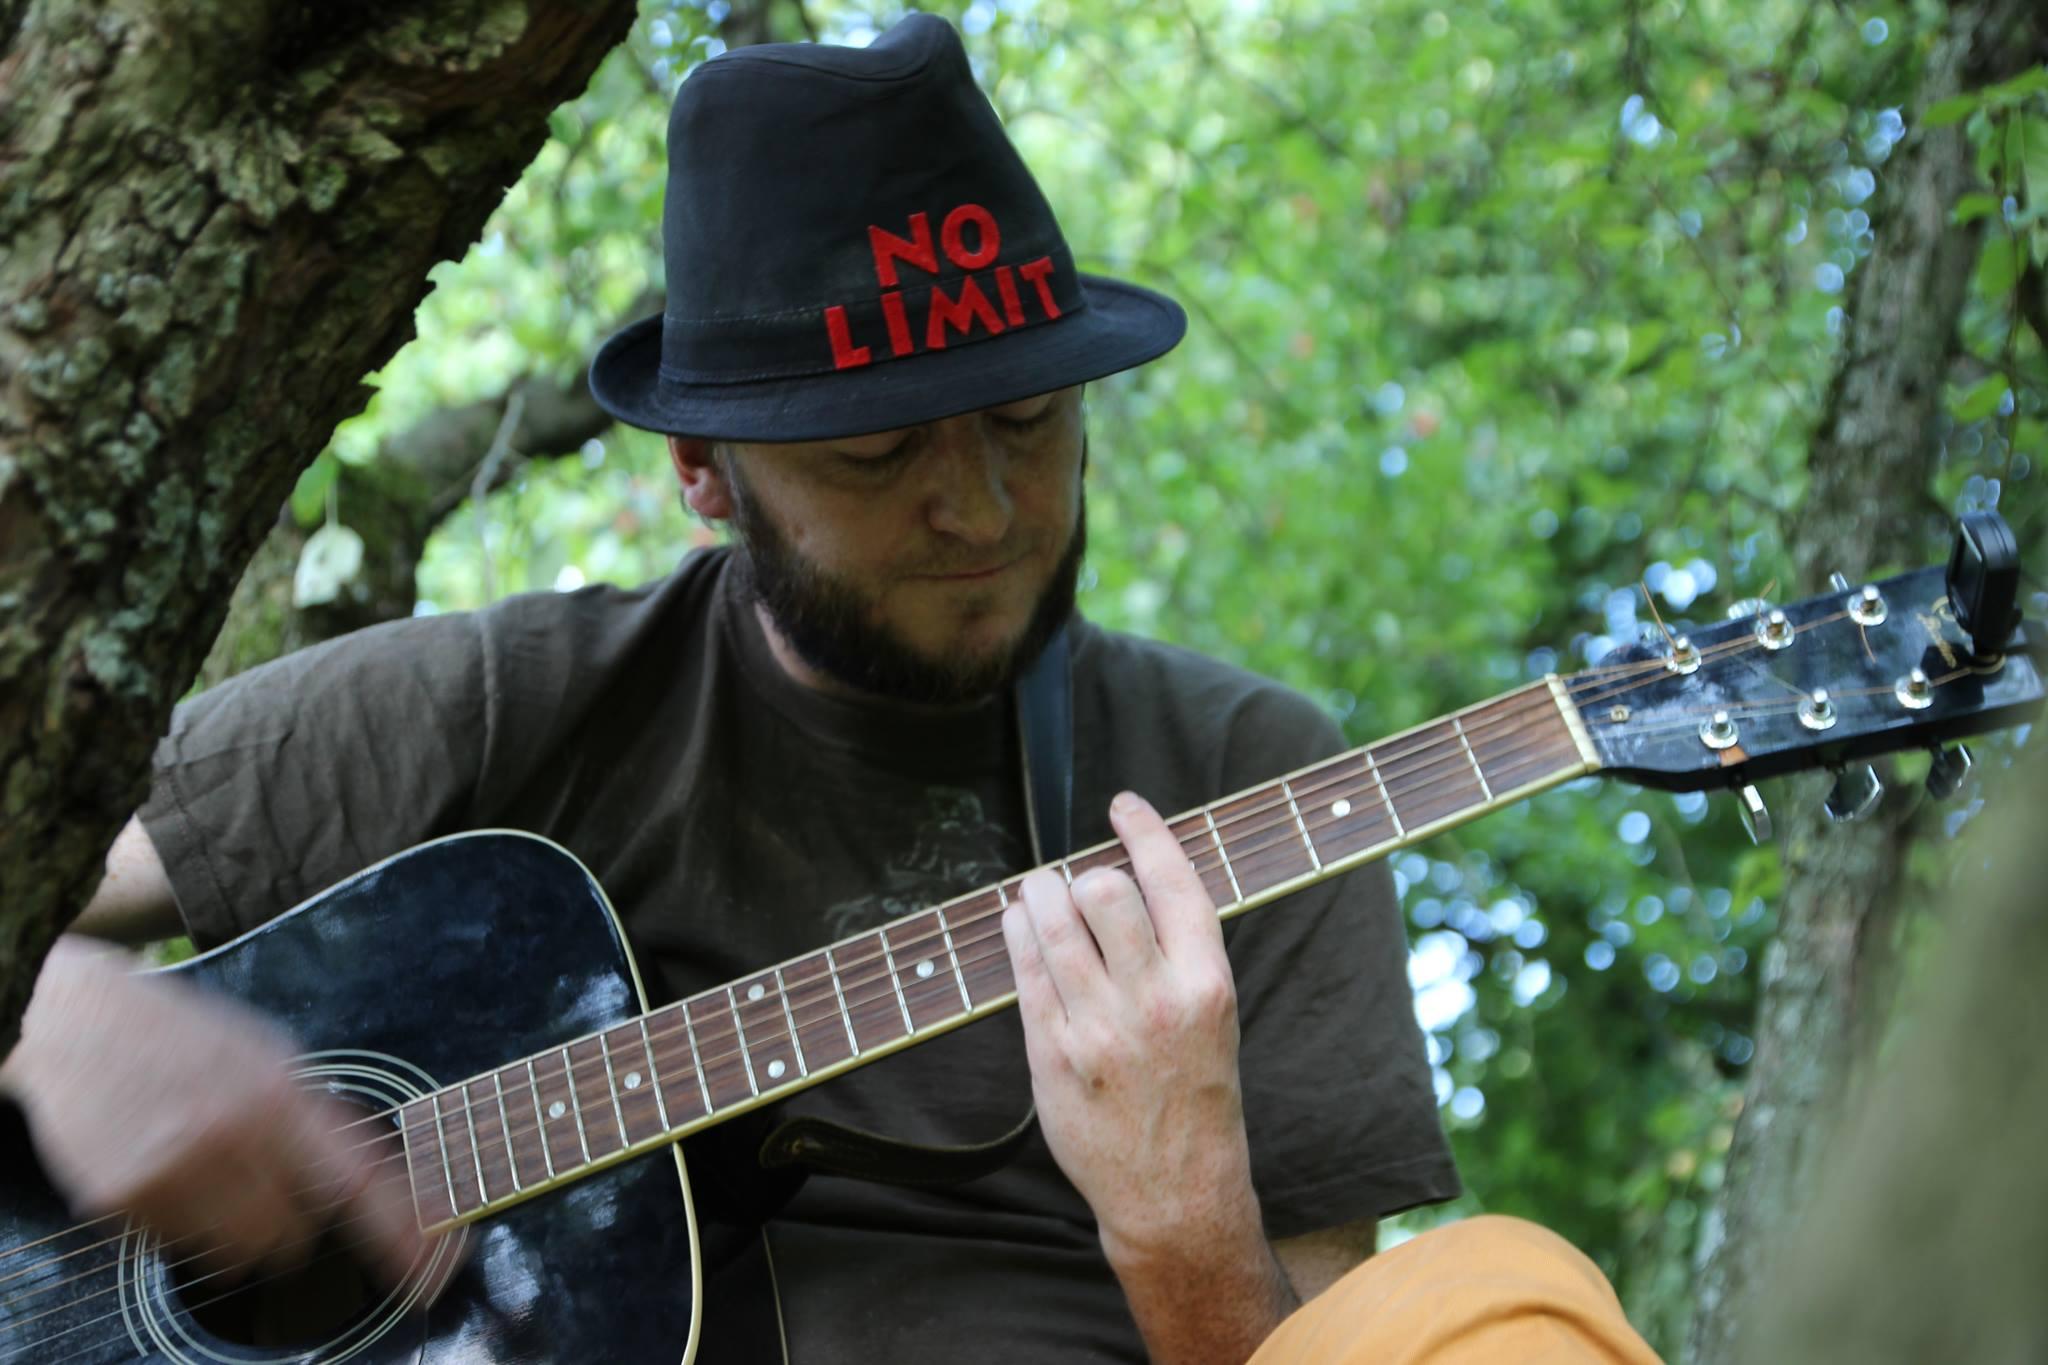 Konzert: No Limit - Welt retten leicht gemacht